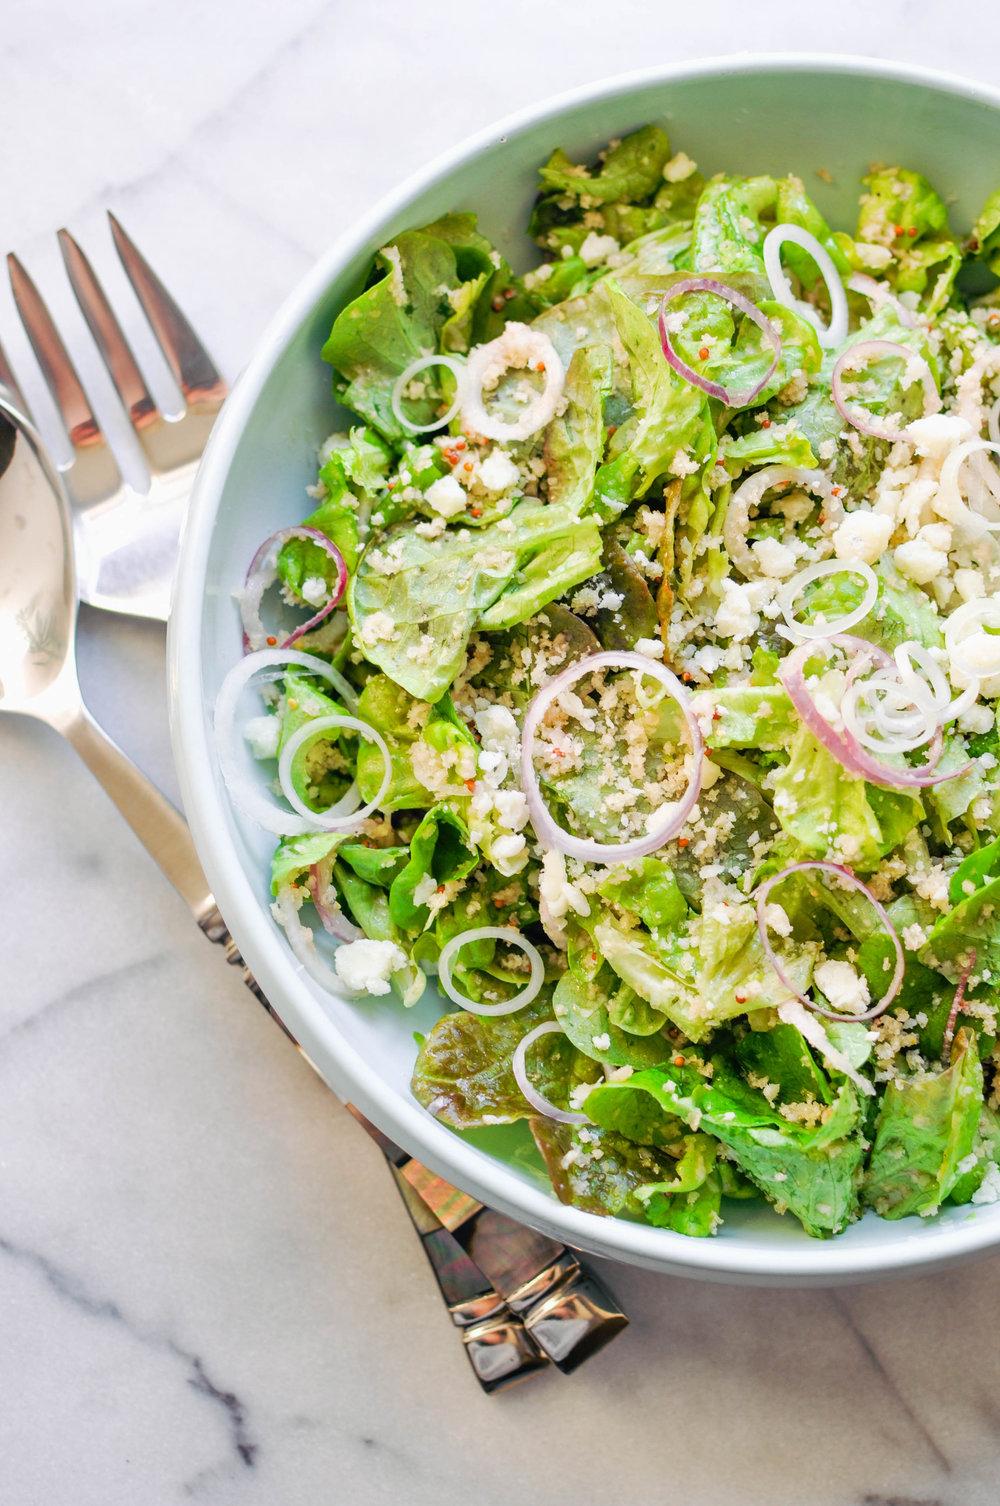 Source:  http://www.shinyhappybright.com/blog/my-favorite-green-salad